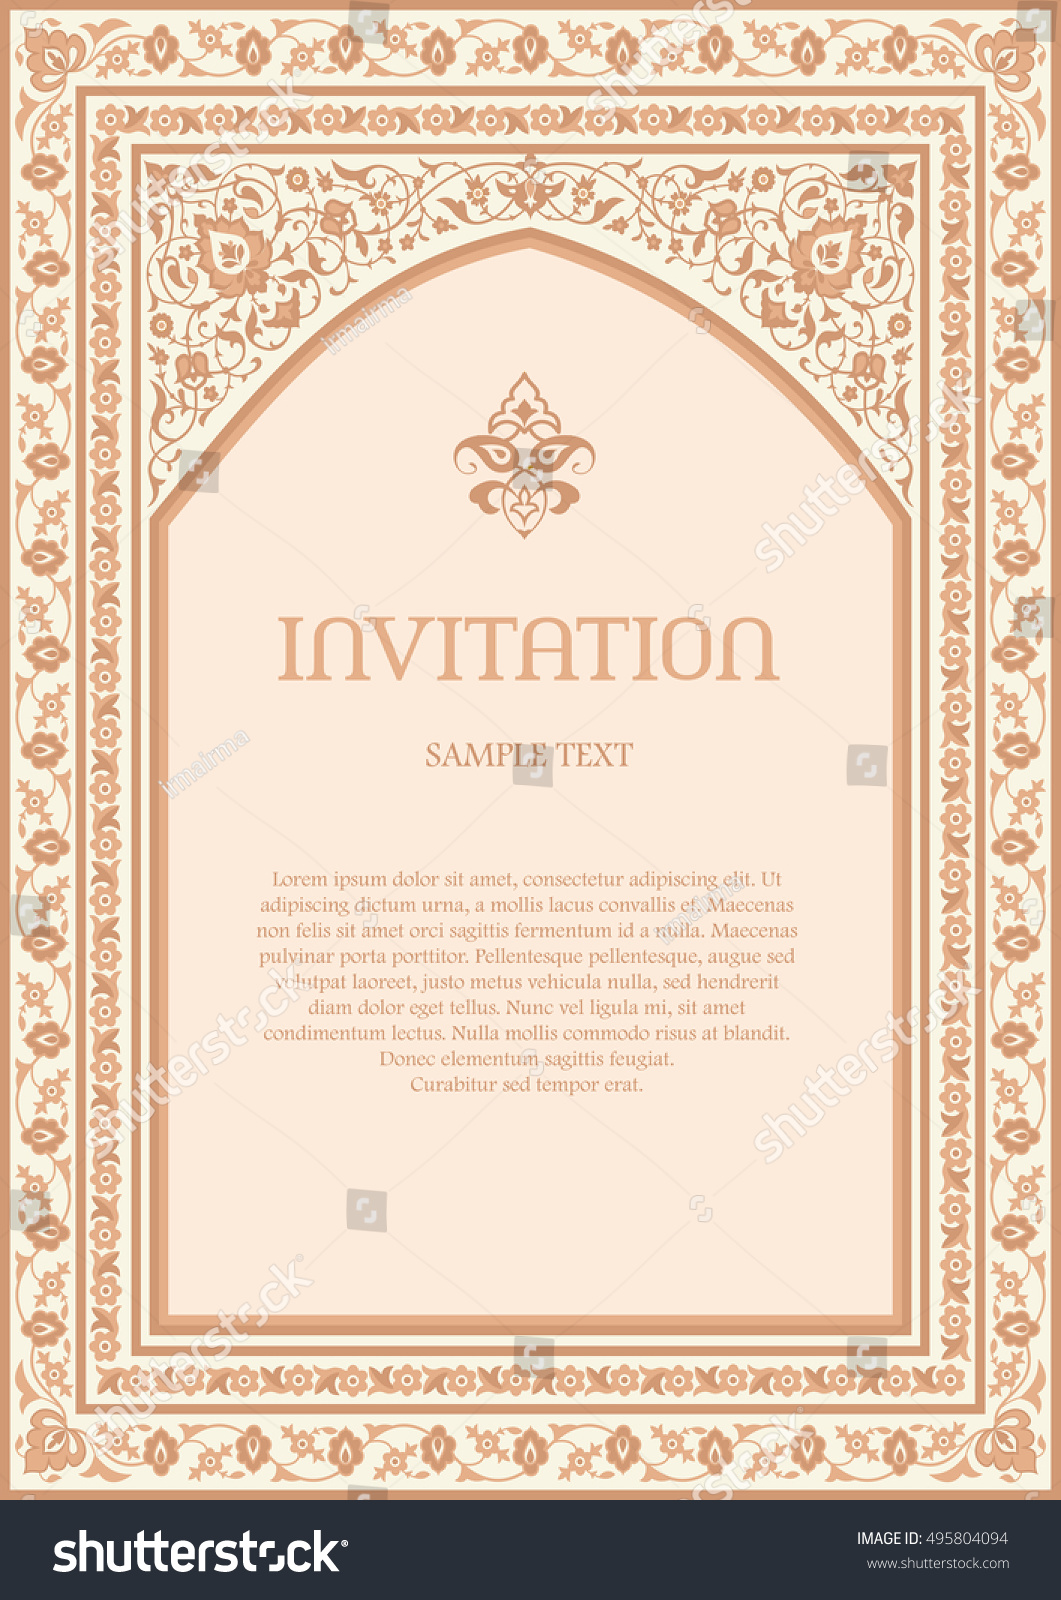 Invitation Design Template Ornate Frame Arabic Stock Vector (2018 ...